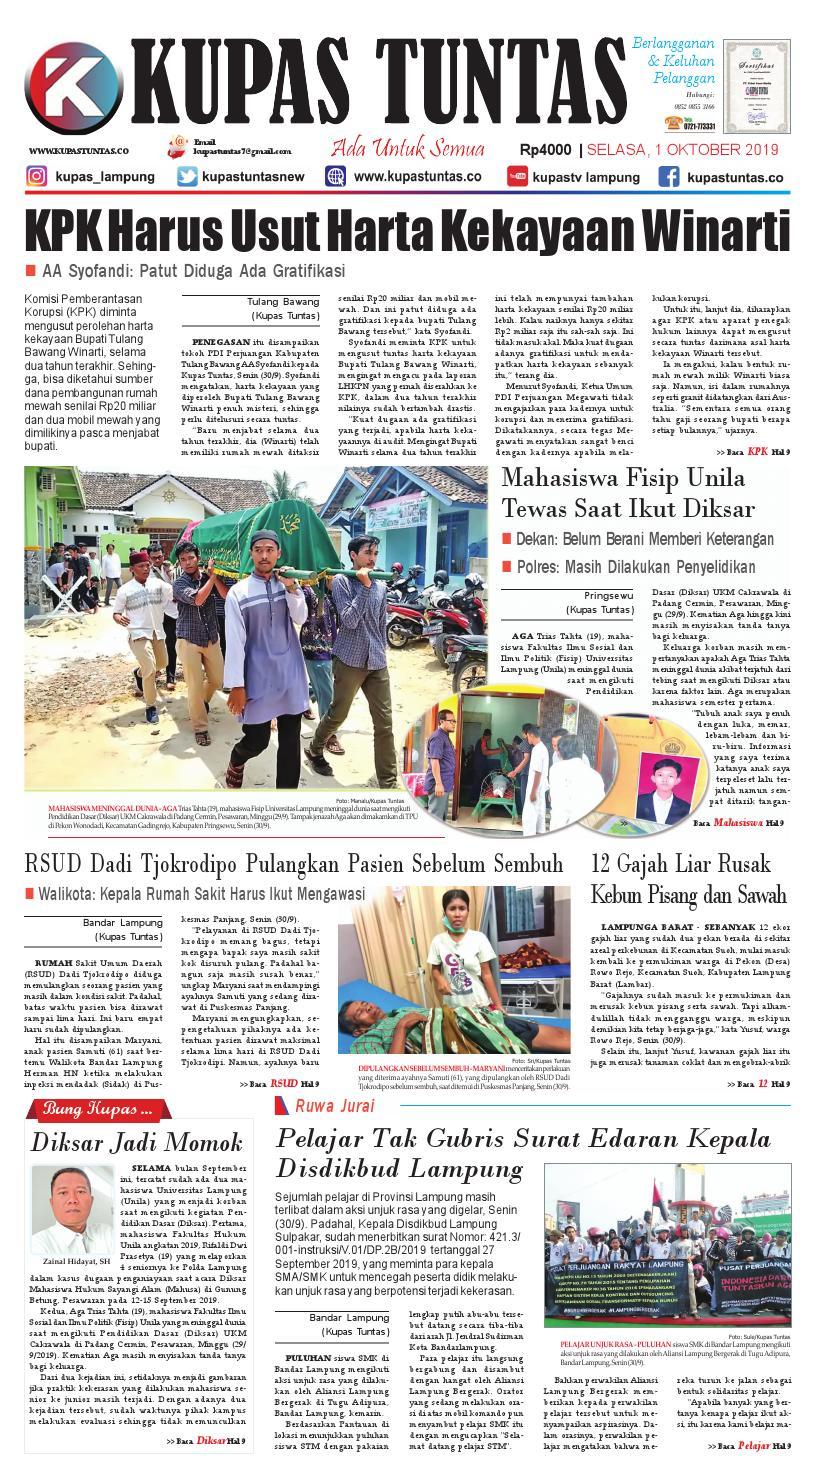 Surat Kabar Harian Kupas Tuntas Edisi Selasa 01 Oktober